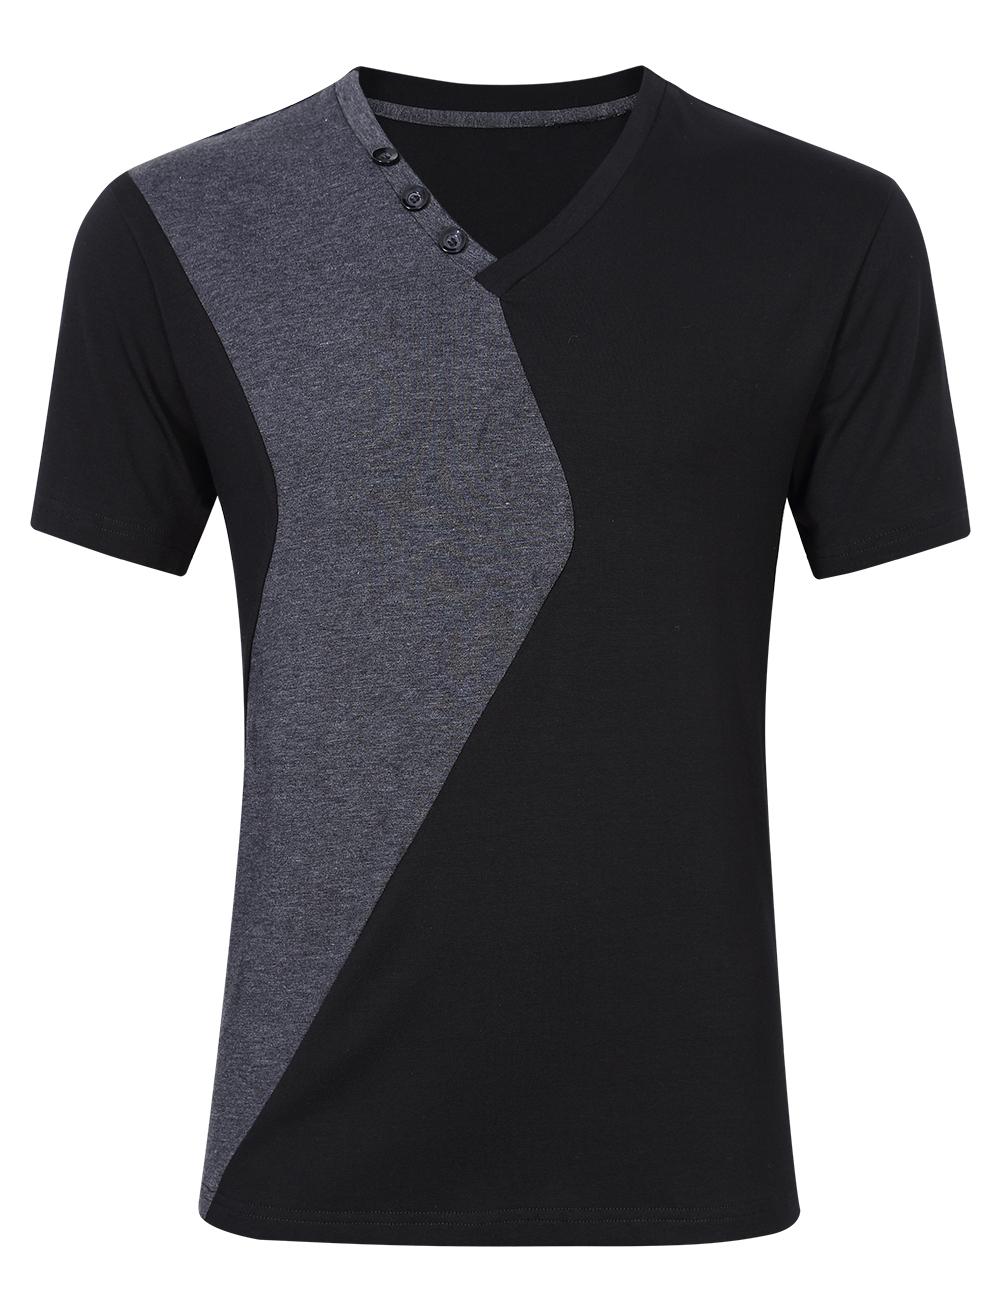 [US Direct] Young Horse Men Fashion Cotton Color Block Short Sleeve Slim T-shirt Black XL Black_3XL